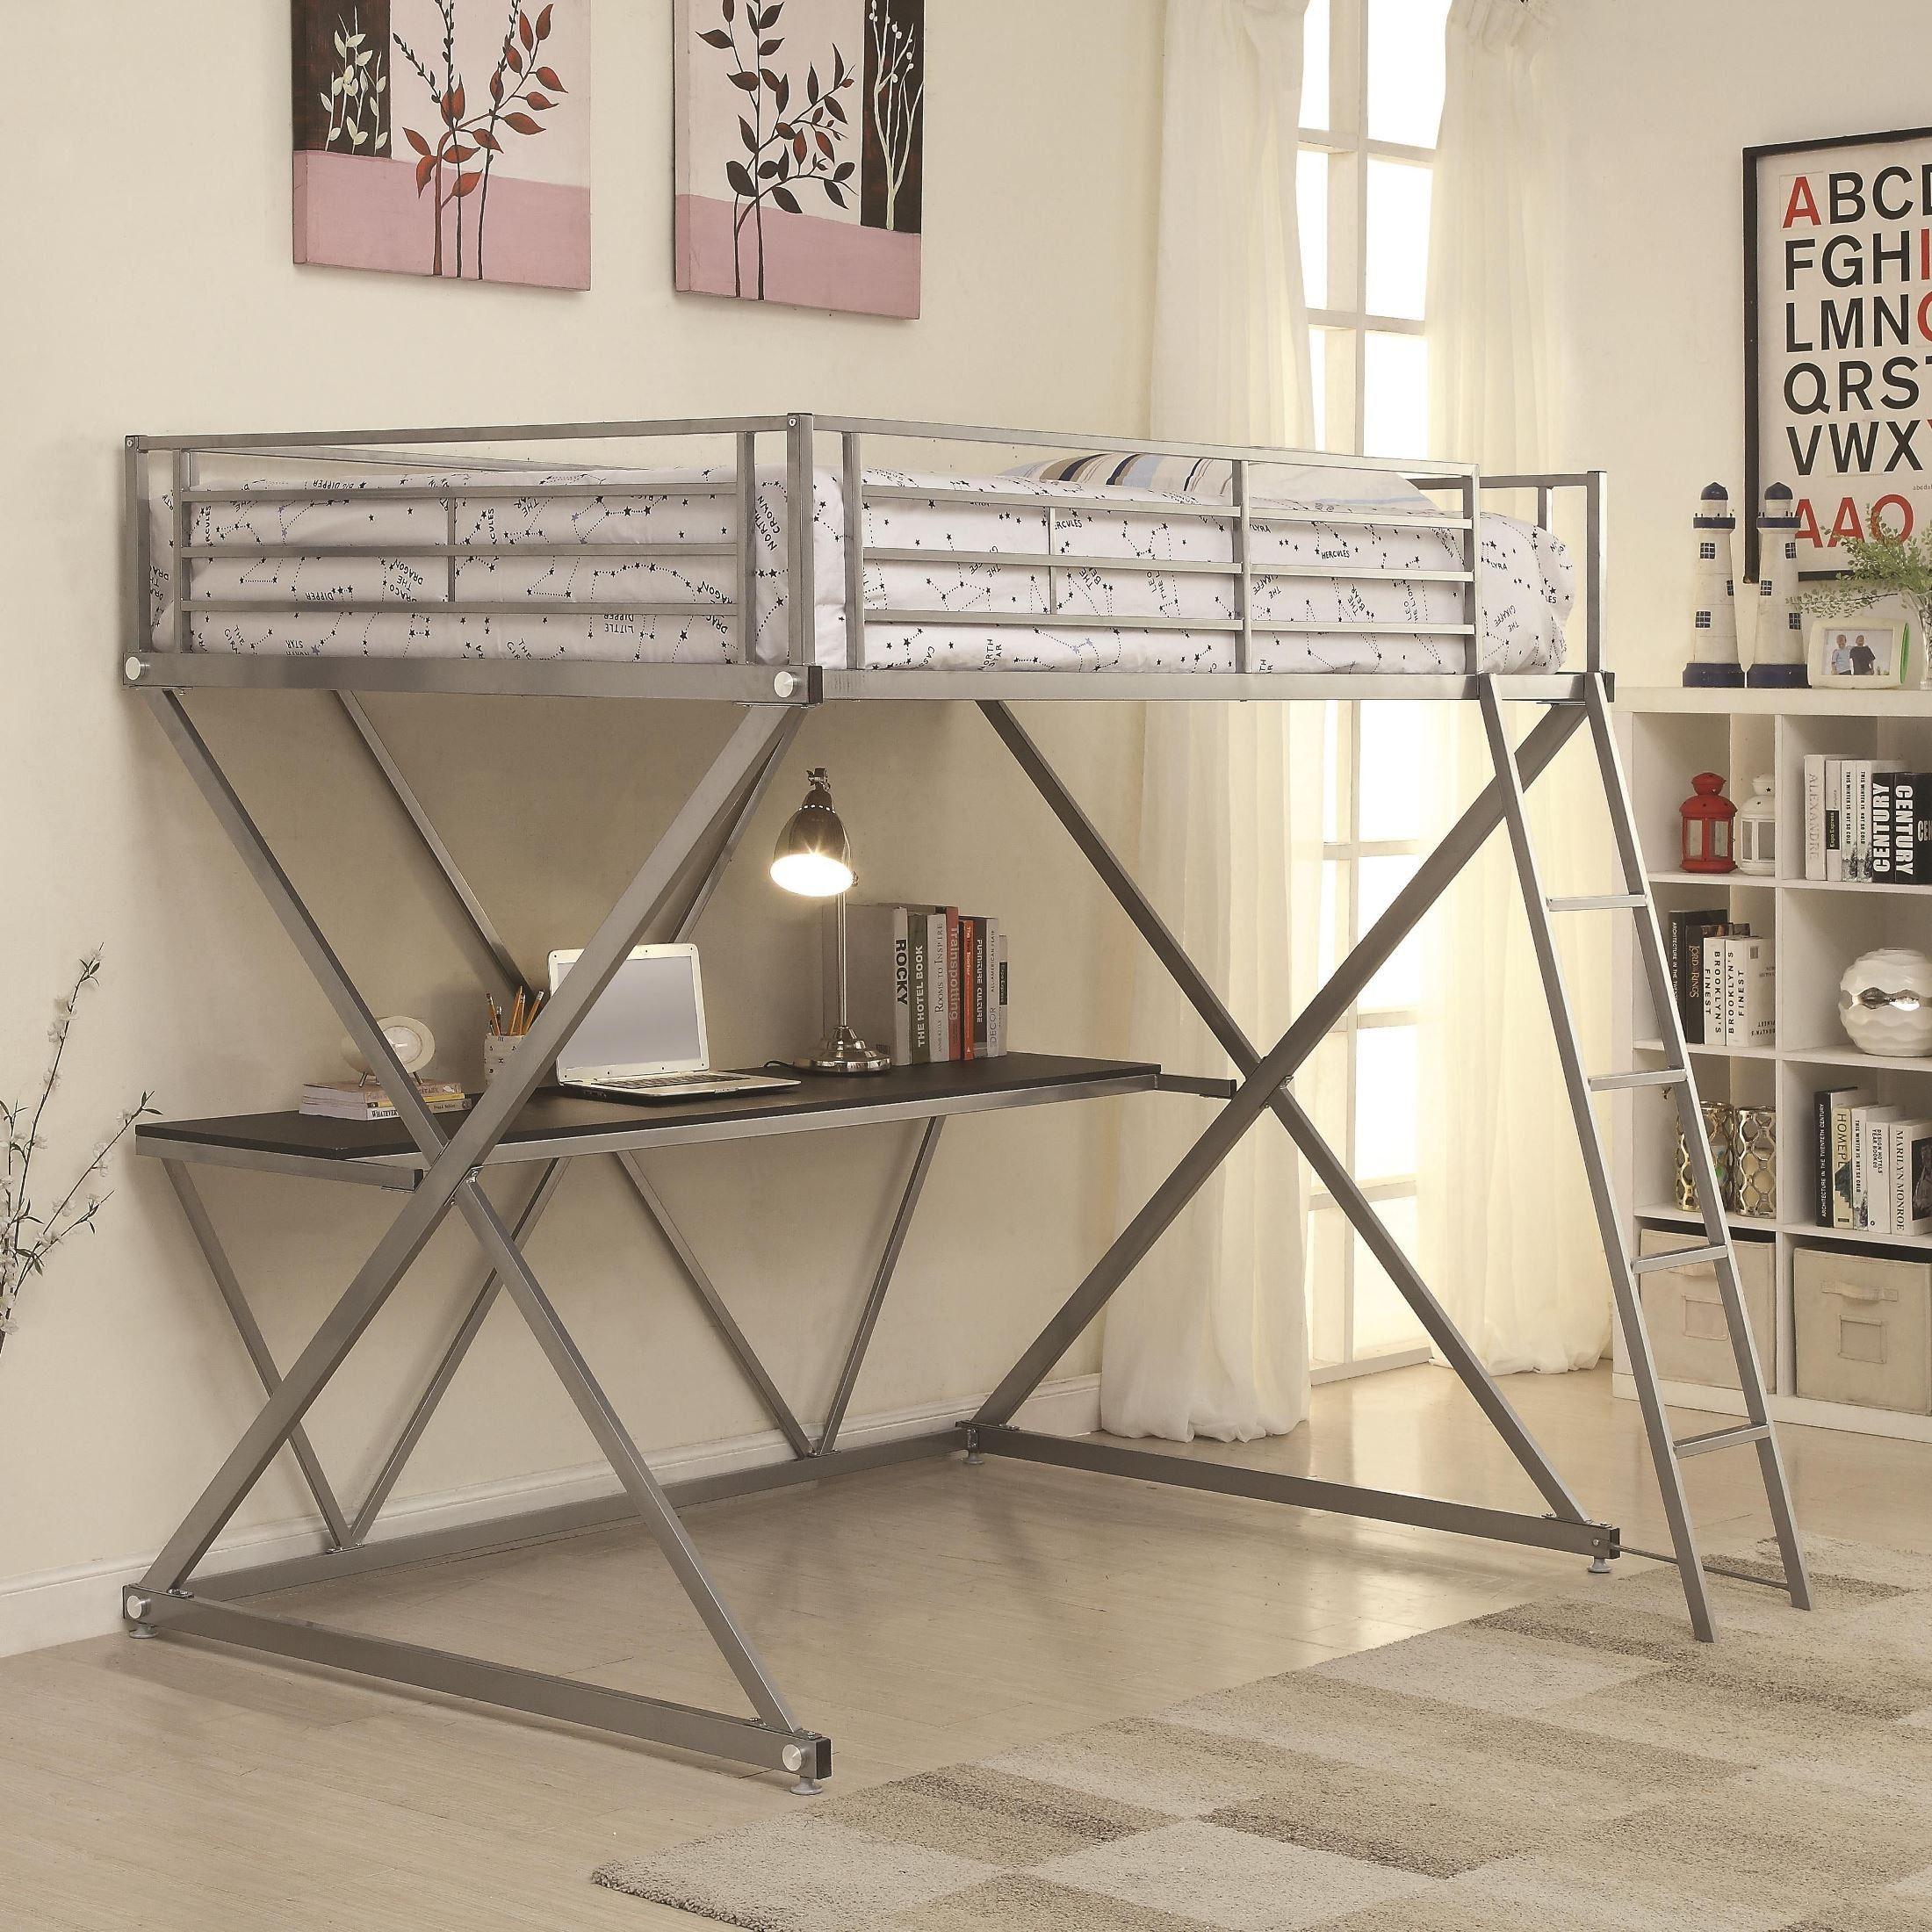 Twin loft bed dimensions  Interesting Loft Bed Metal With Desk  loft bed  Pinterest  Lofts